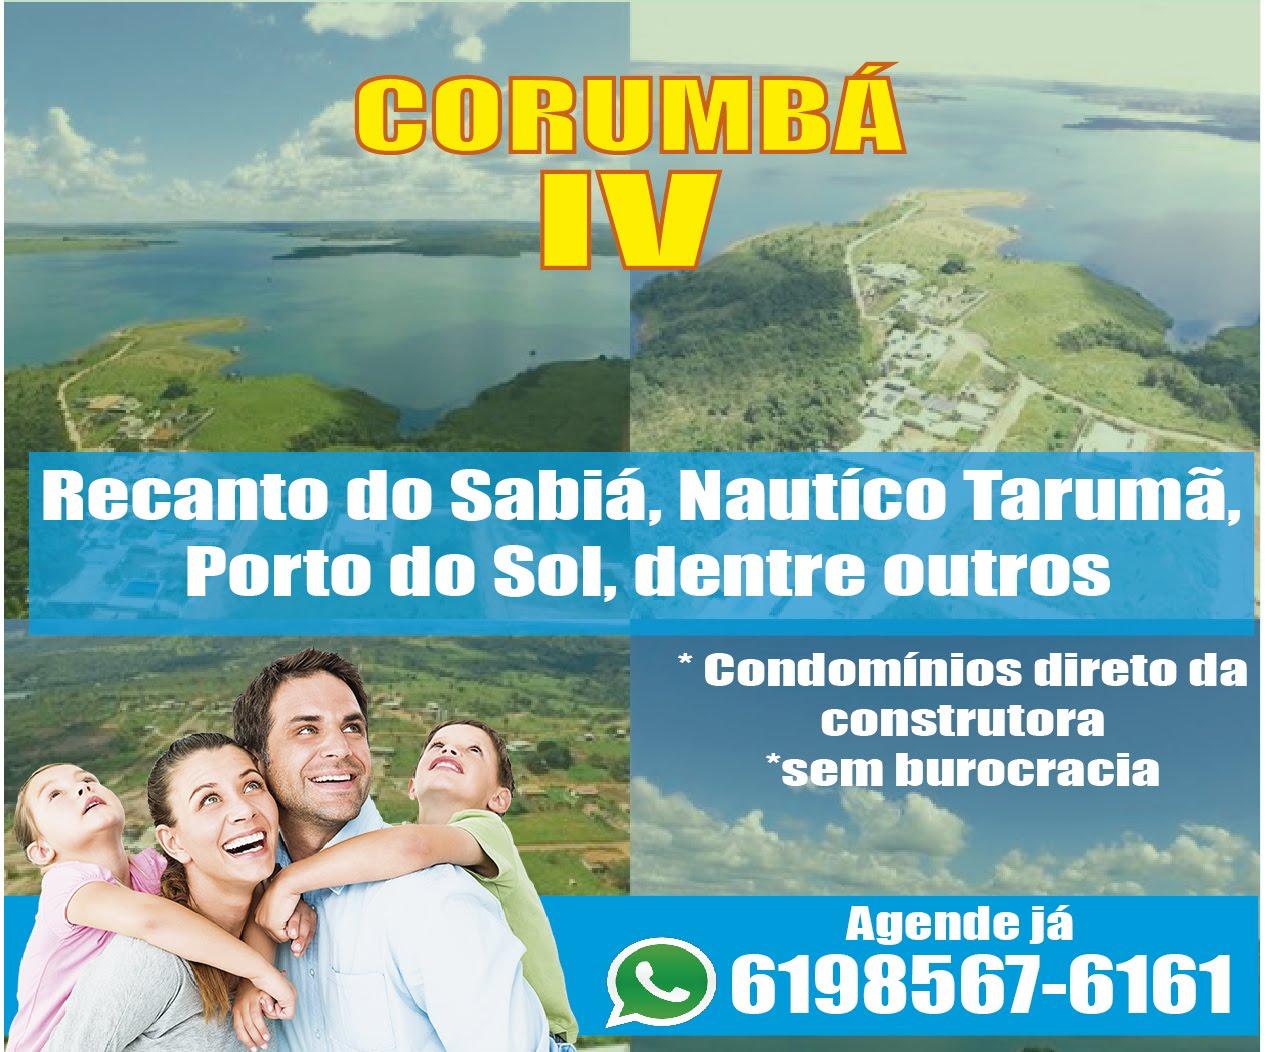 CORUMBA IV